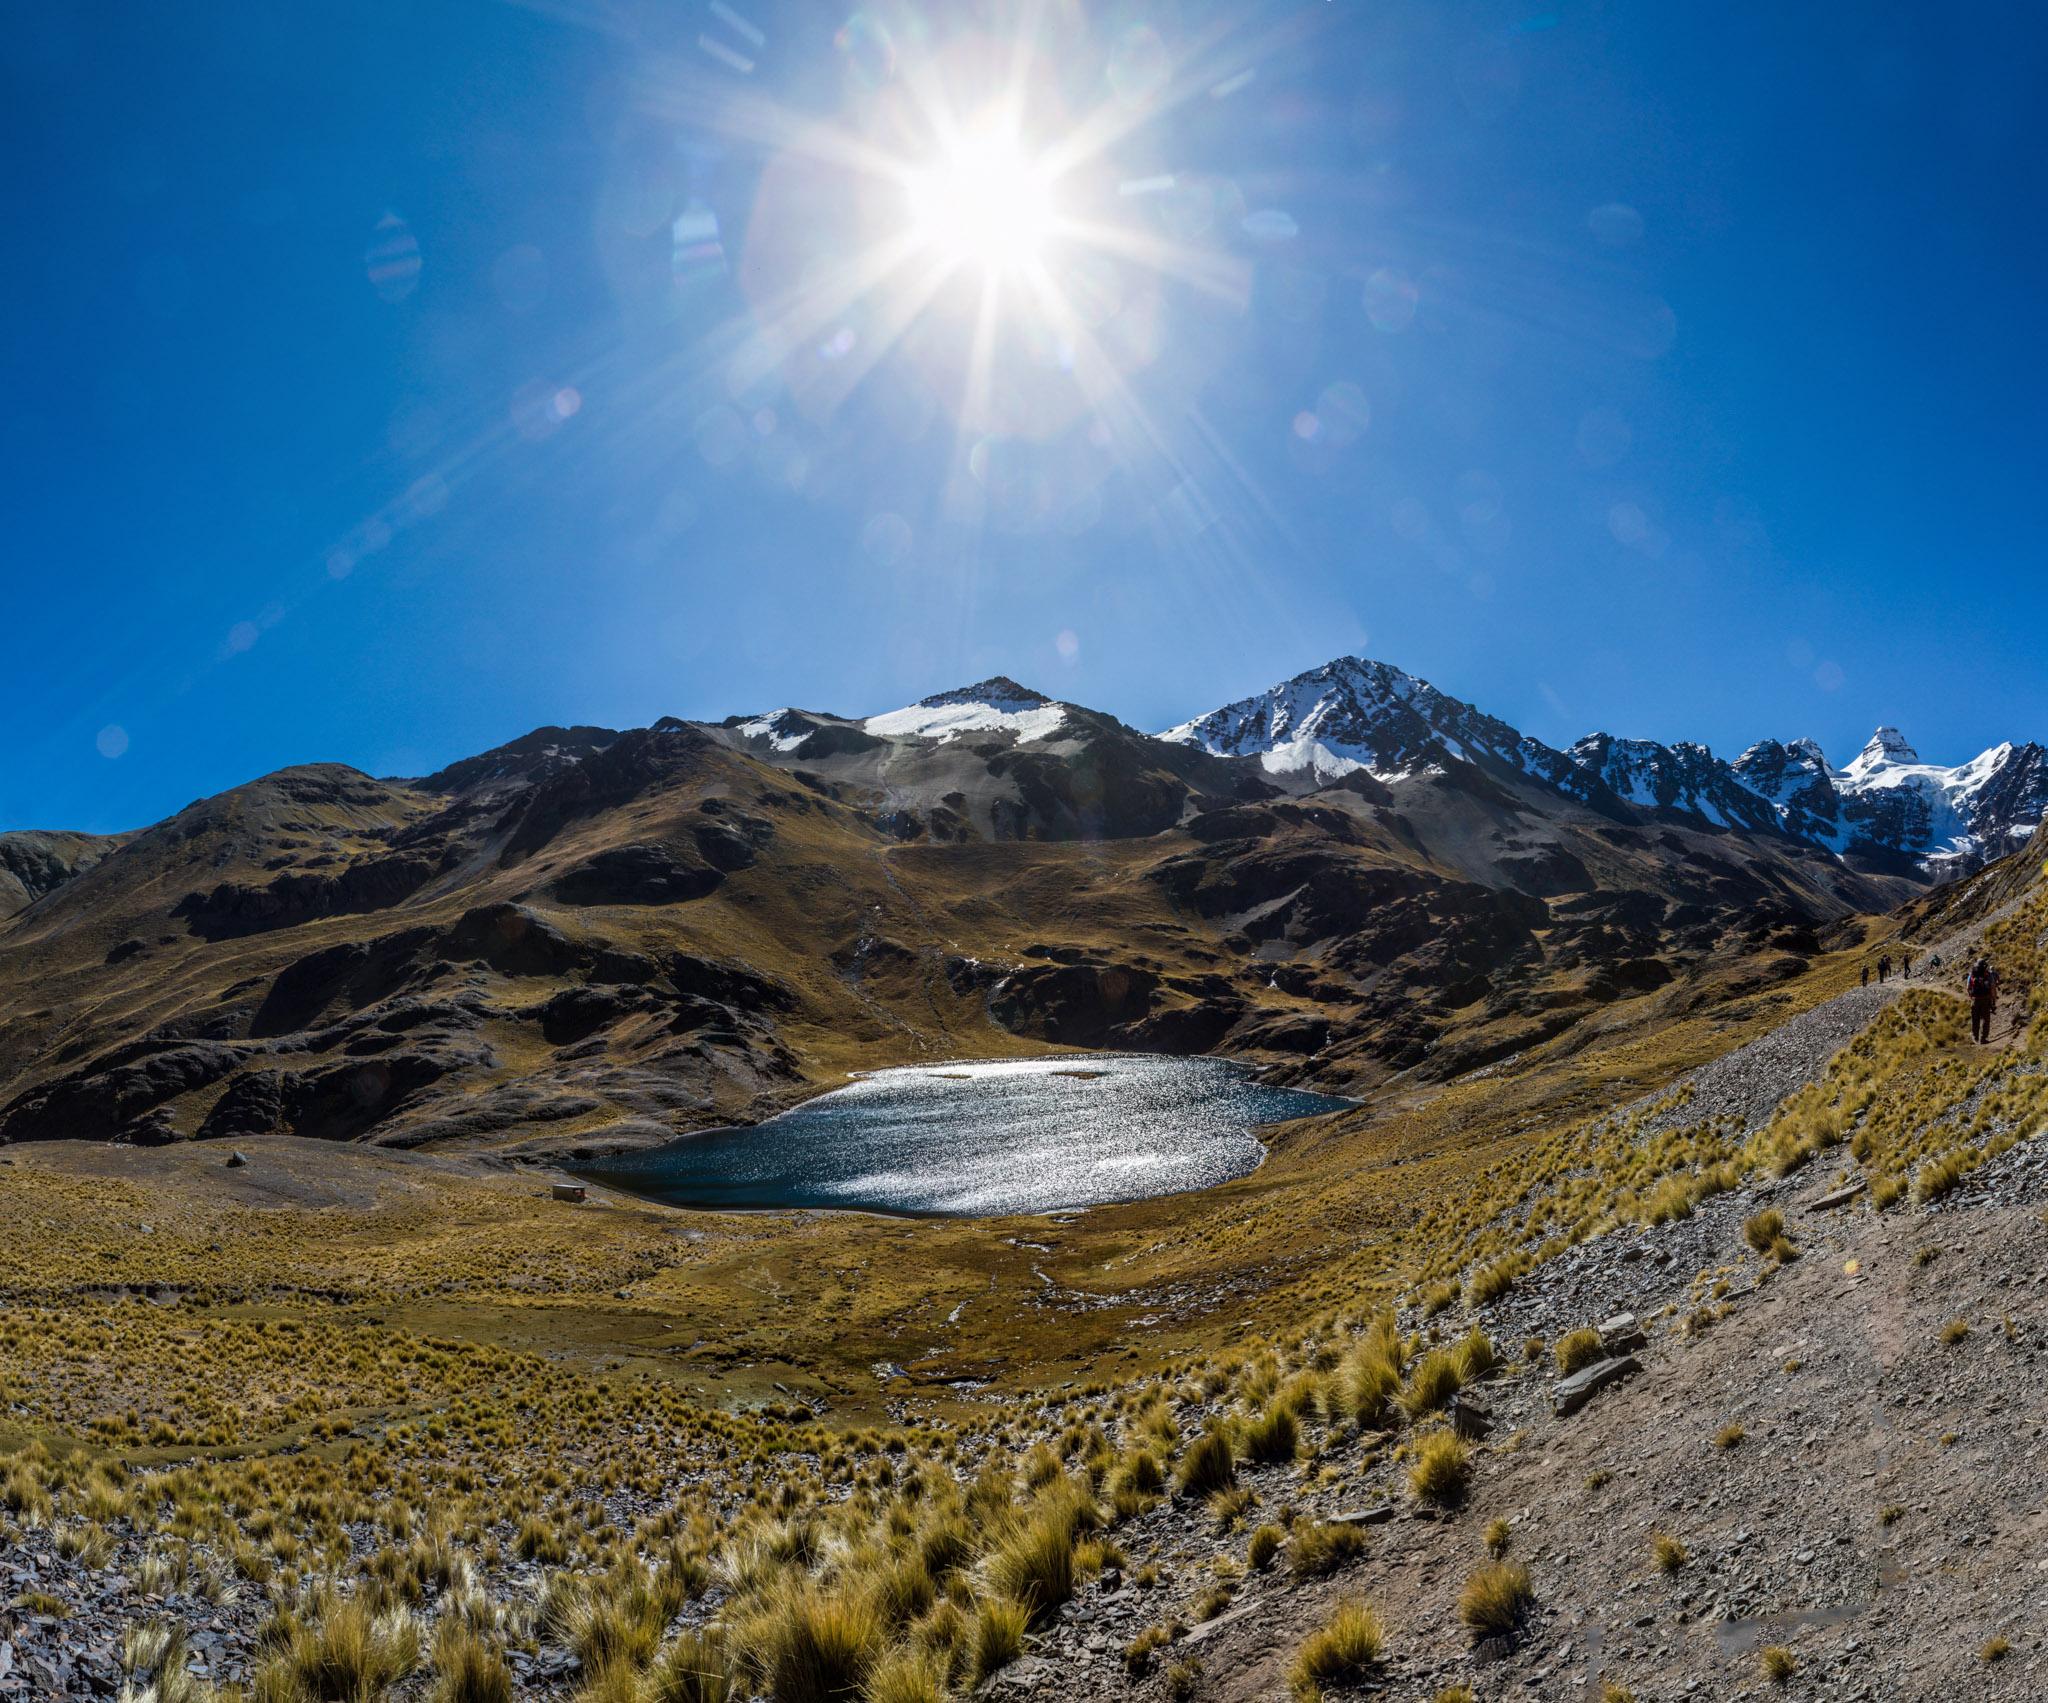 Ali-Barqawi-Studios-Explore-Series-Travel-Adventure-Documentary-C4CGAZA-Bolivia-Mount-Tarija-2015-269.jpg